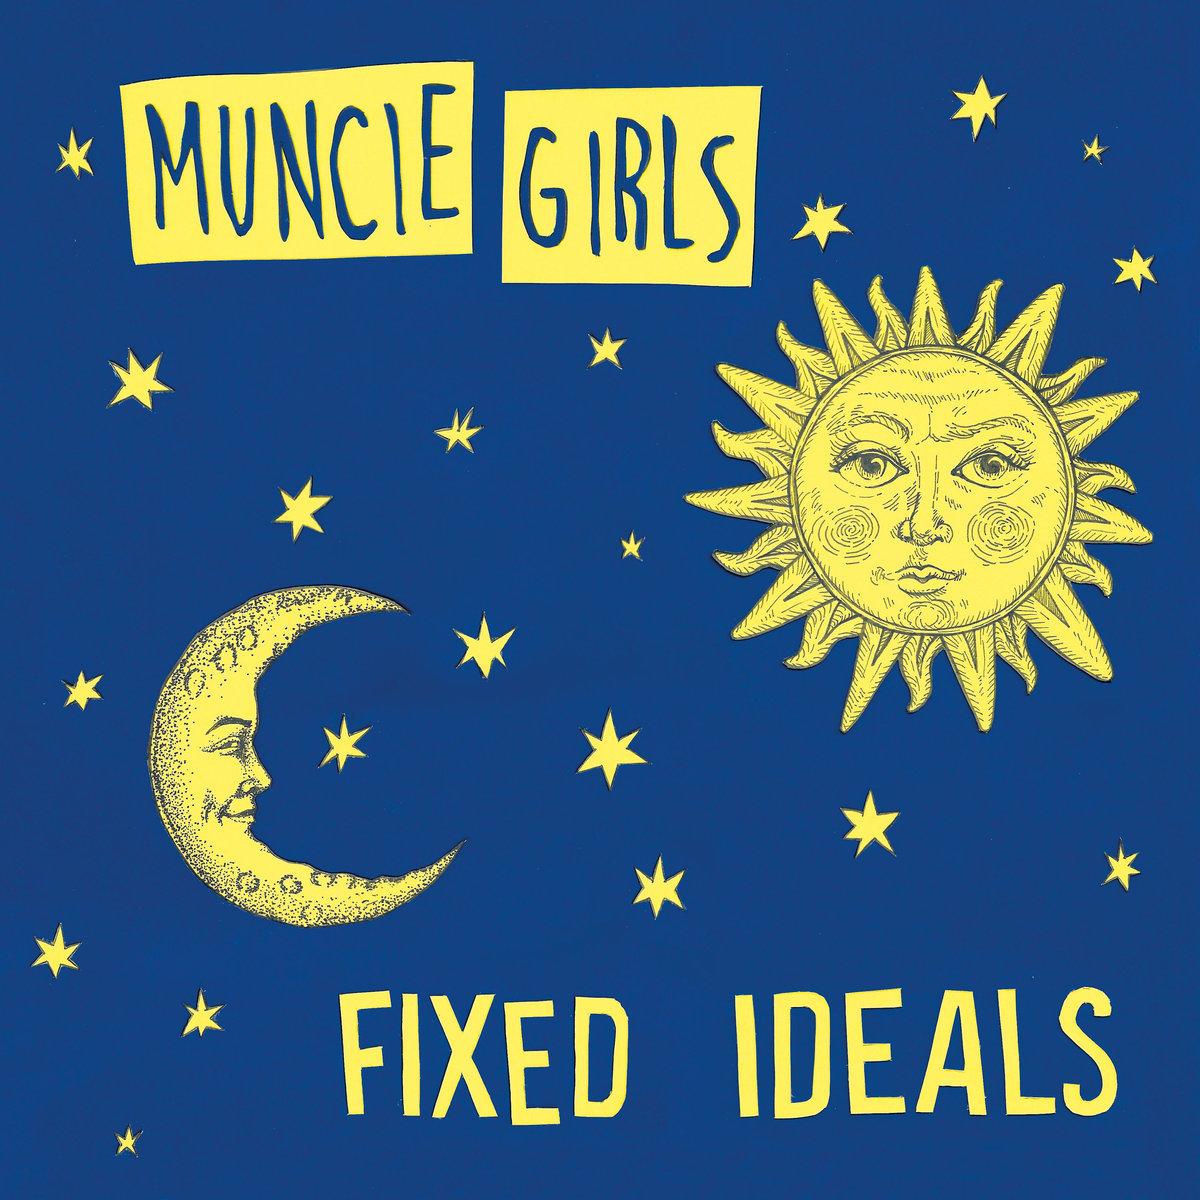 Muncie Girls / Fixed Ideals(500 Ltd LP)